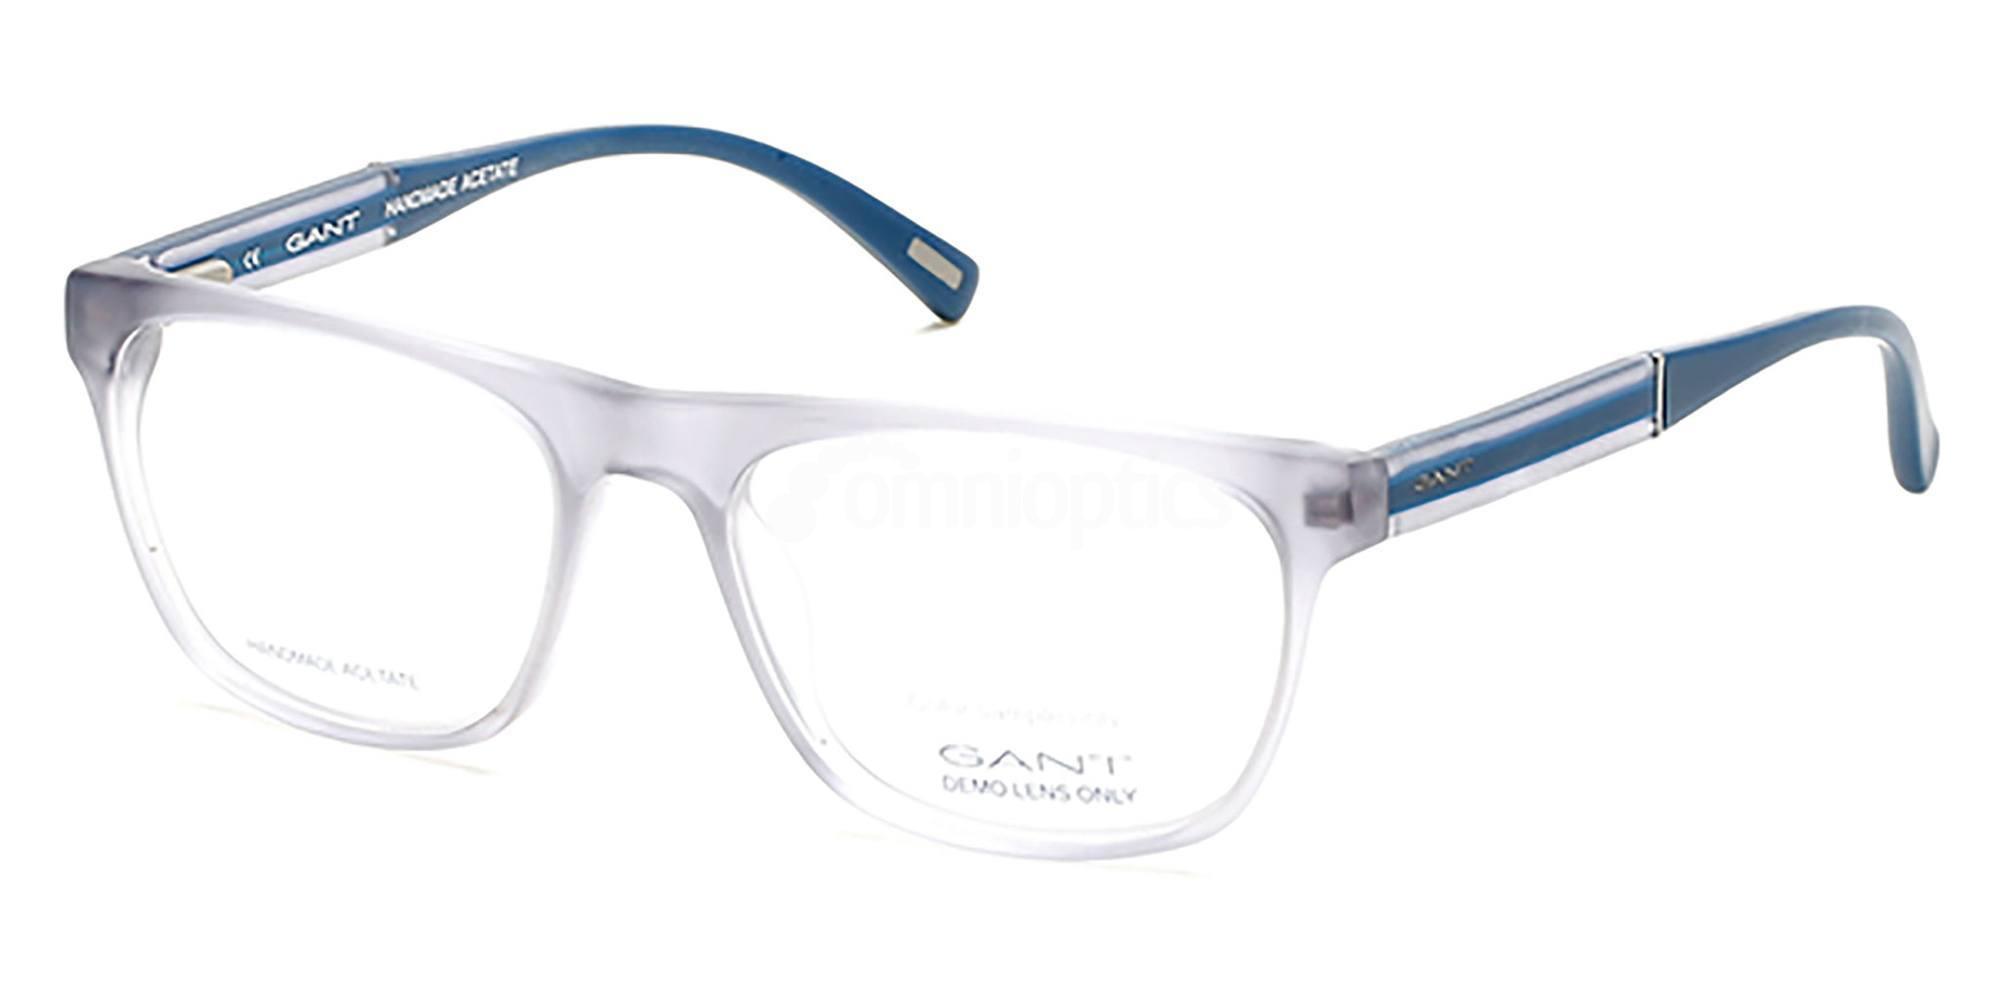 020 GA3098 , Gant